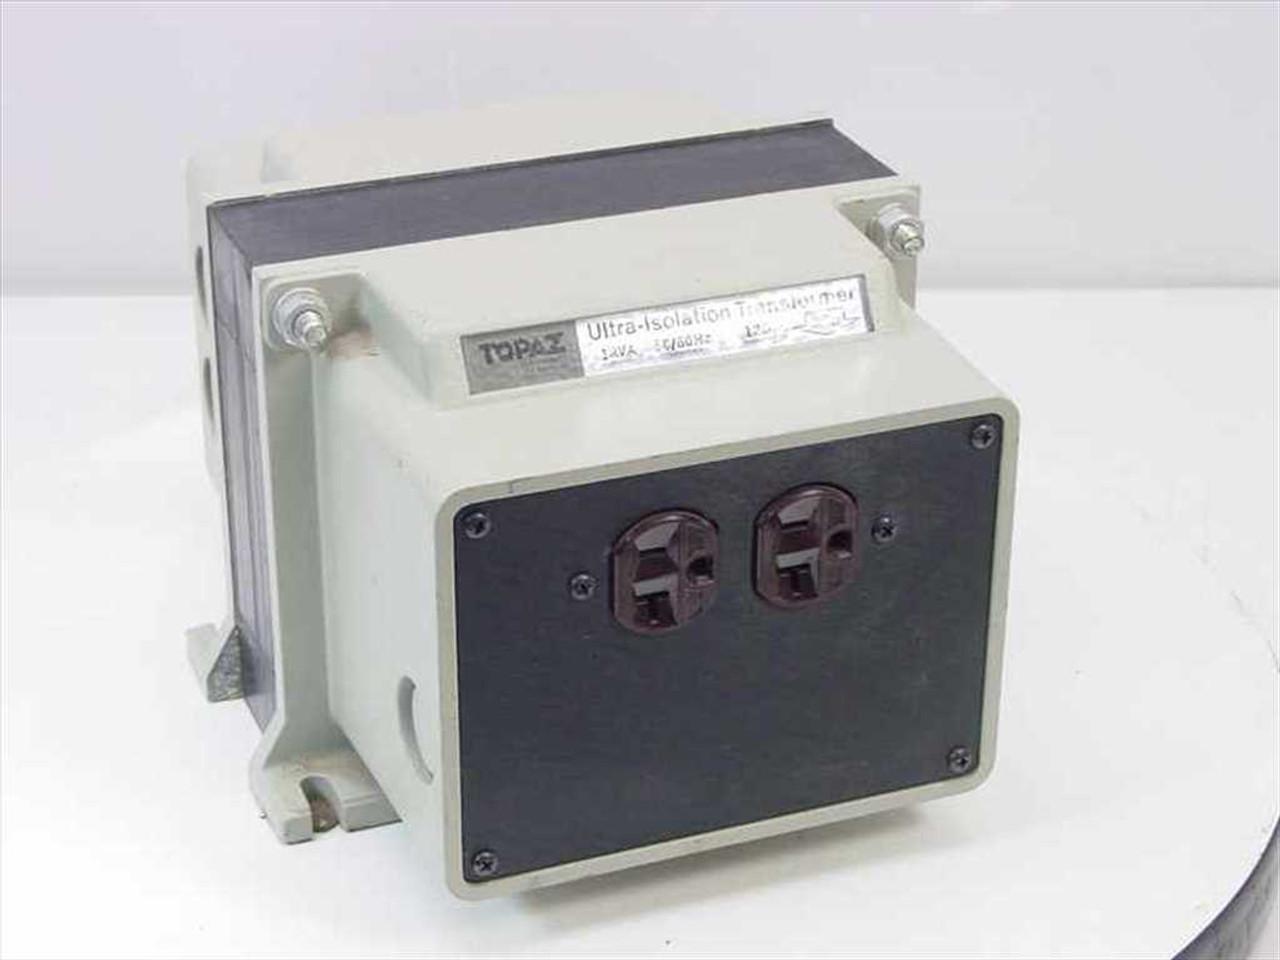 Topaz Electronics 91001 12 Ultra Isolation Transformer Noise Suppressor